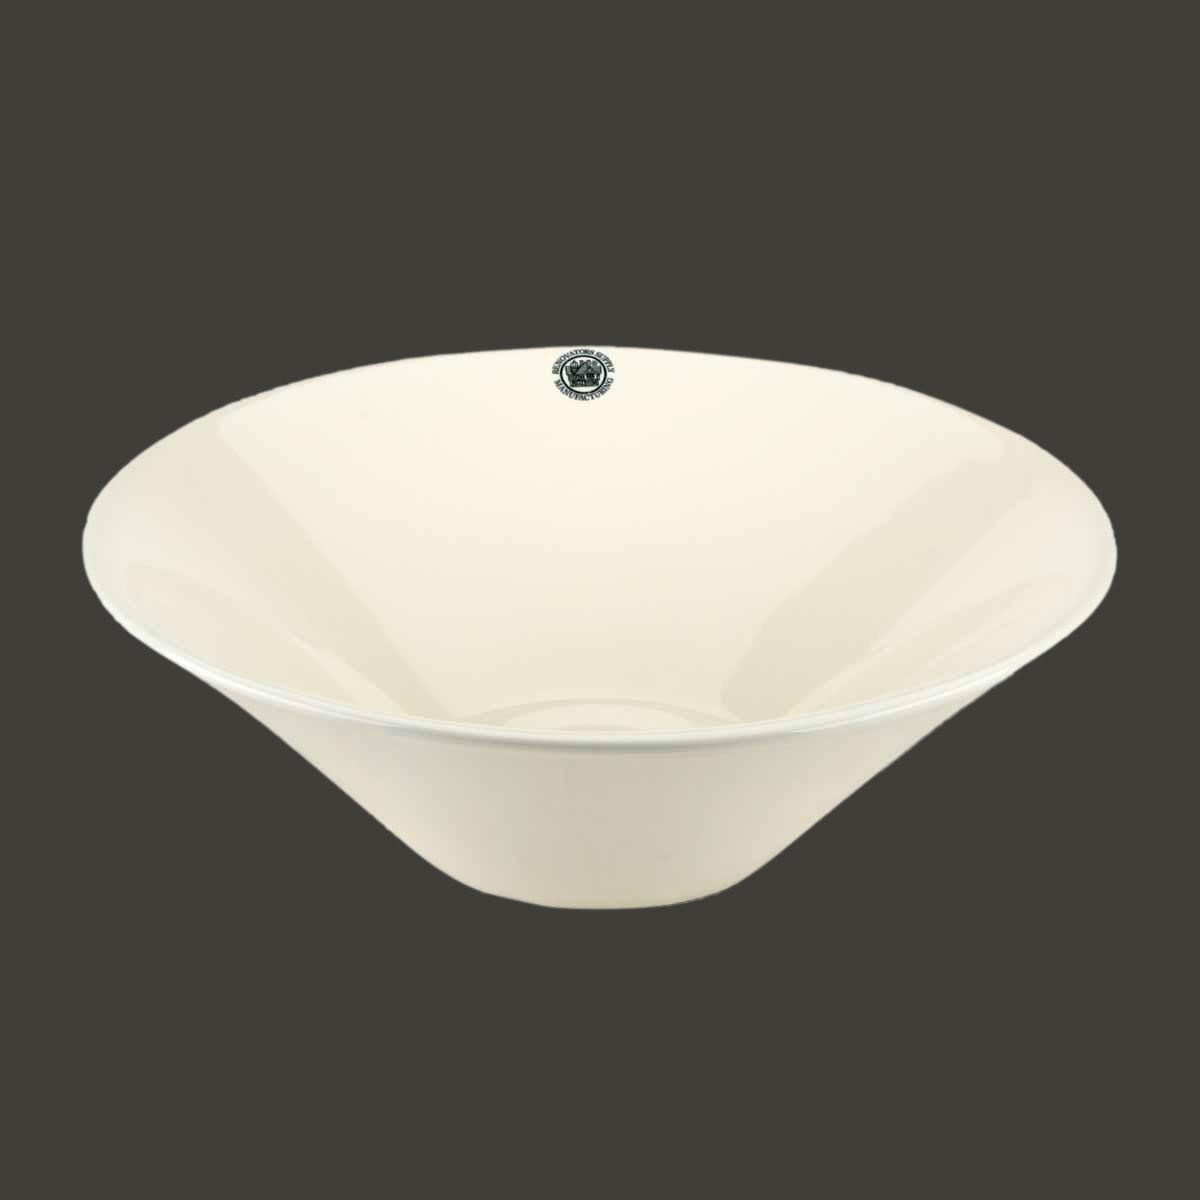 Bathroom Sink Above Counter Vessel Bone Vitreous China